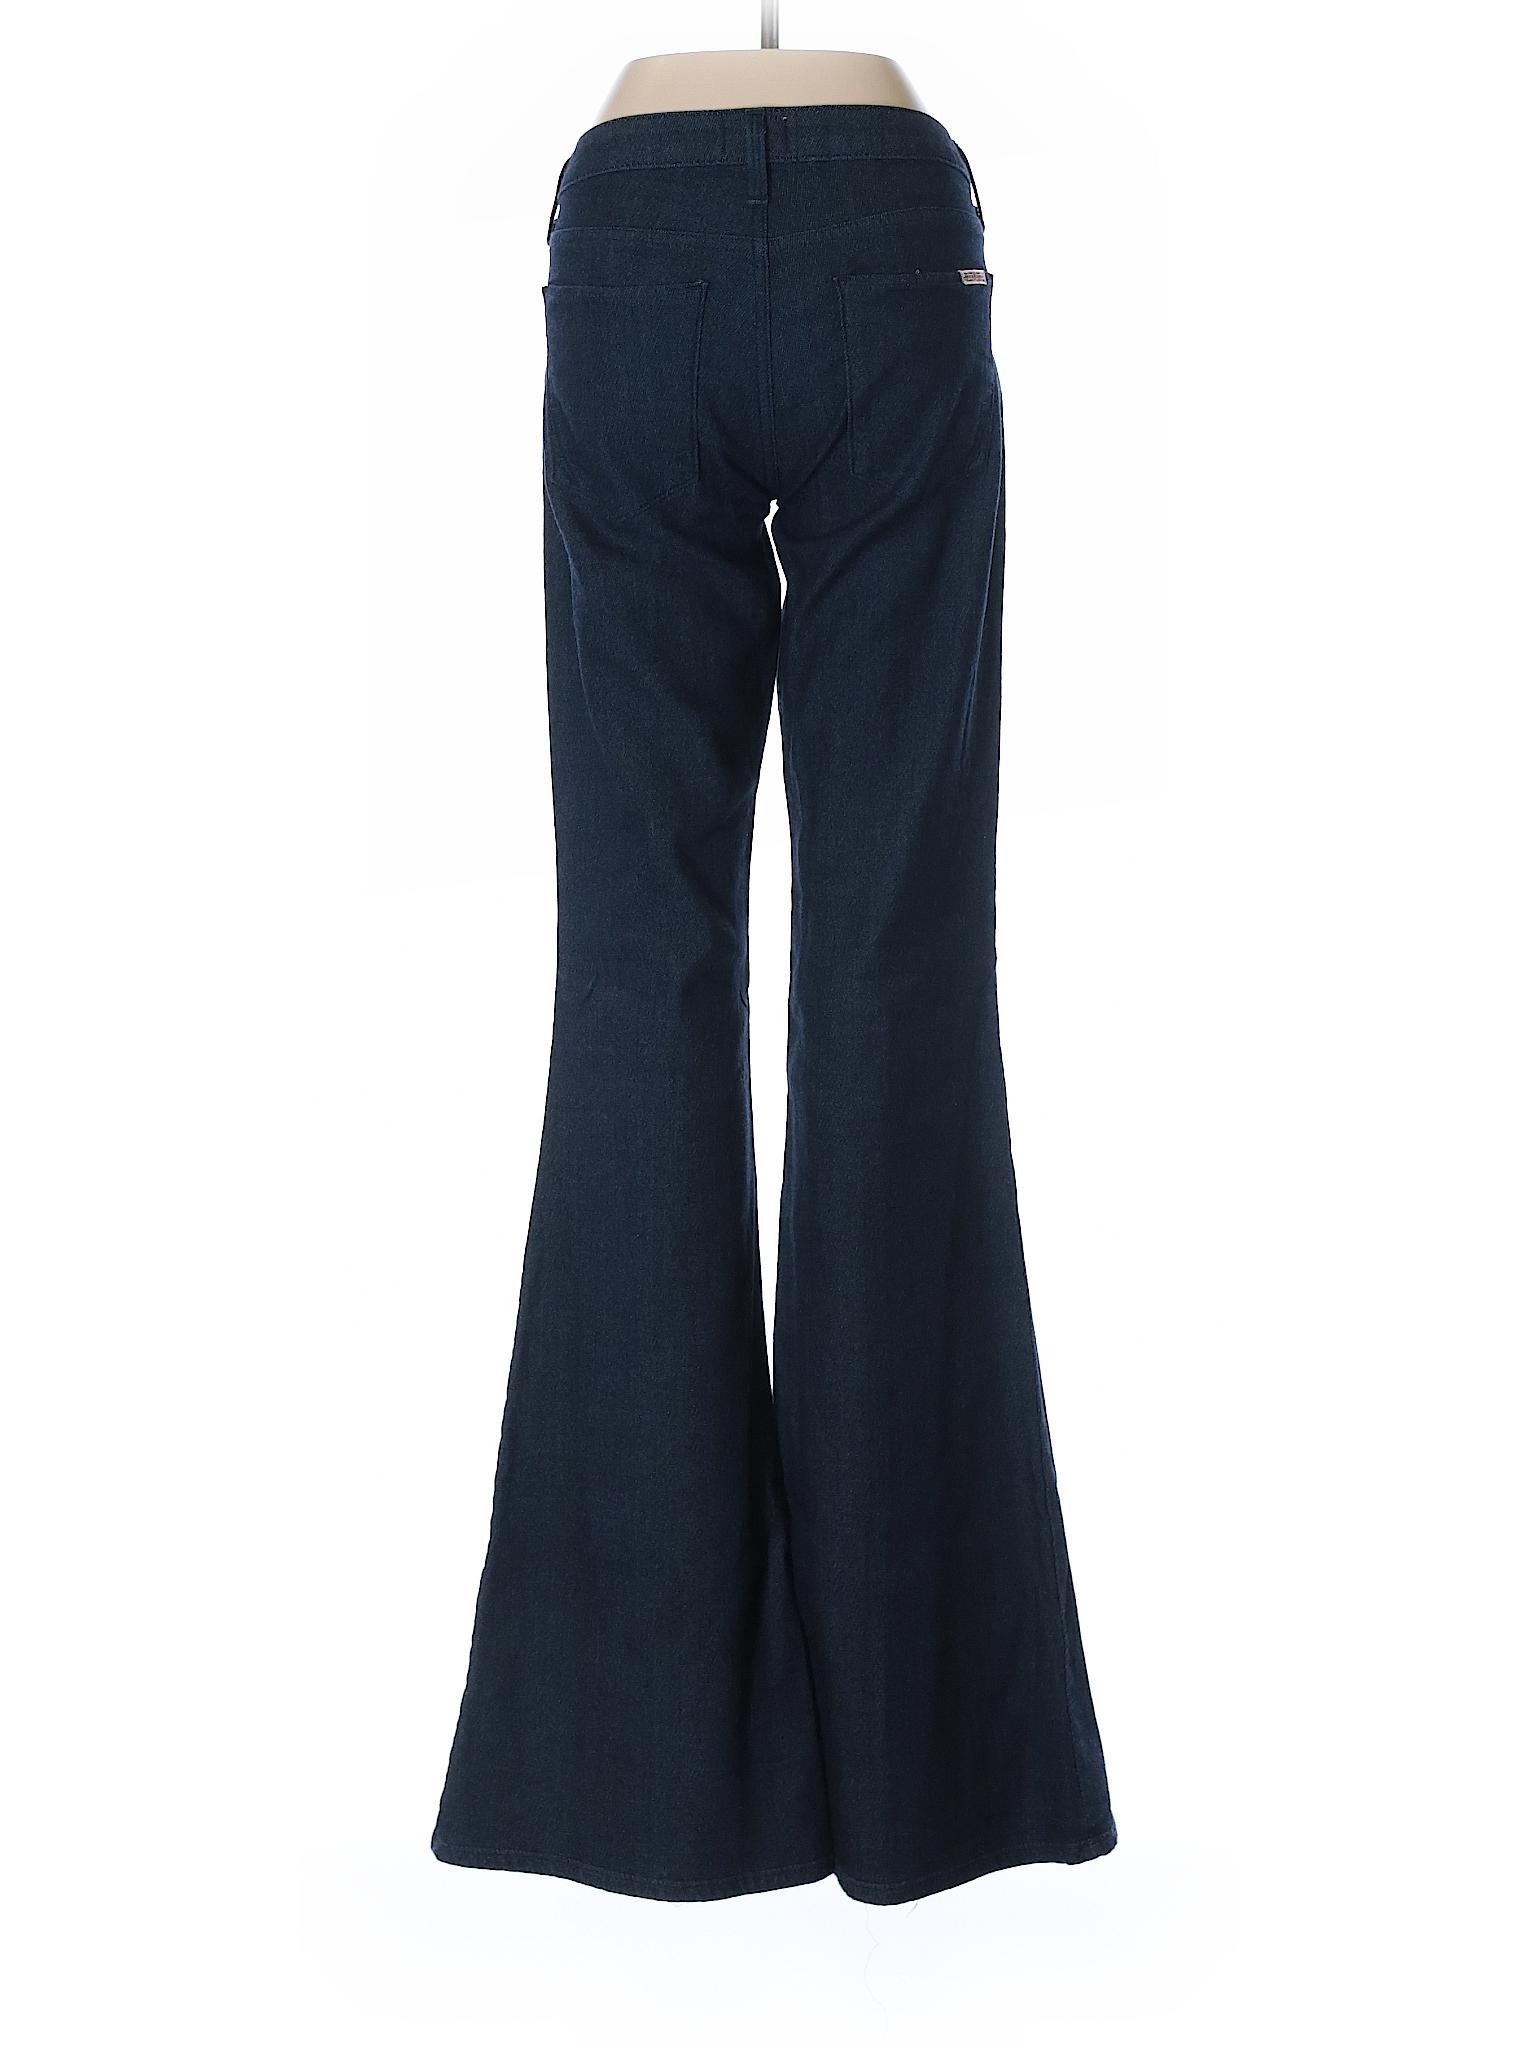 Jeans Hudson Promotion Jeans Jeans Jeans Hudson Hudson Hudson Promotion Promotion Promotion RwCgHqgdx